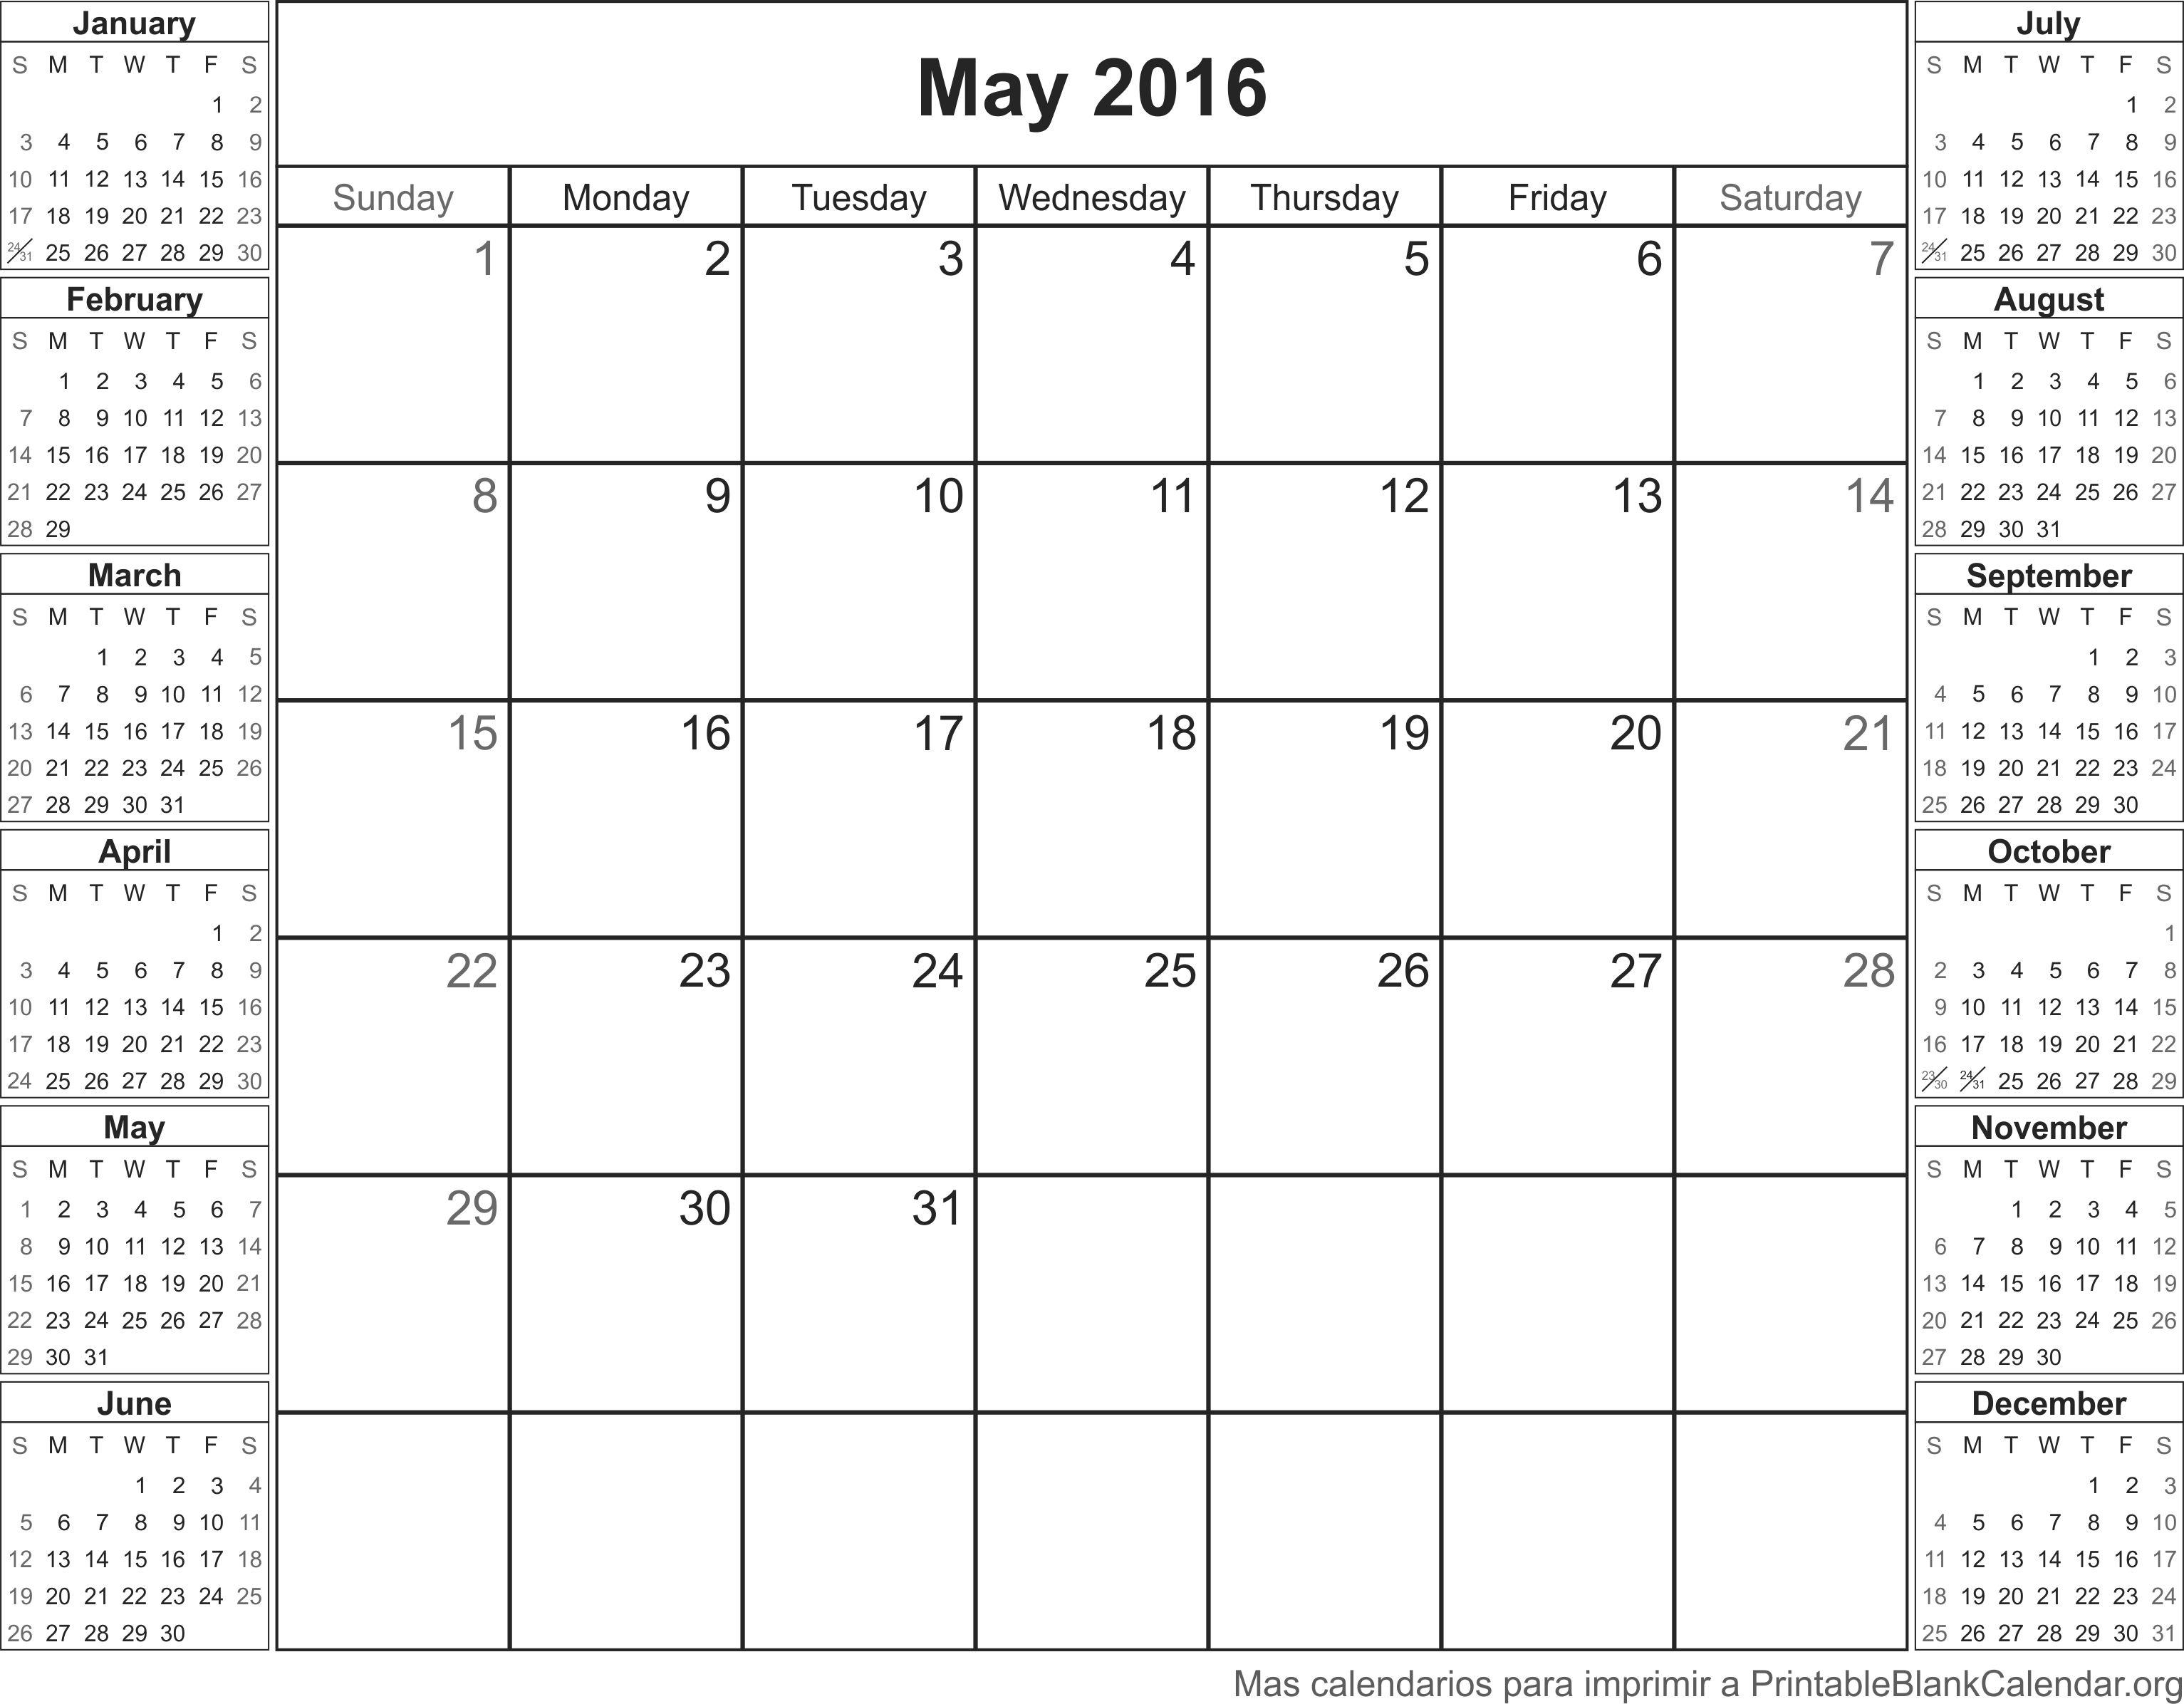 Calendario para imprimir May 2016